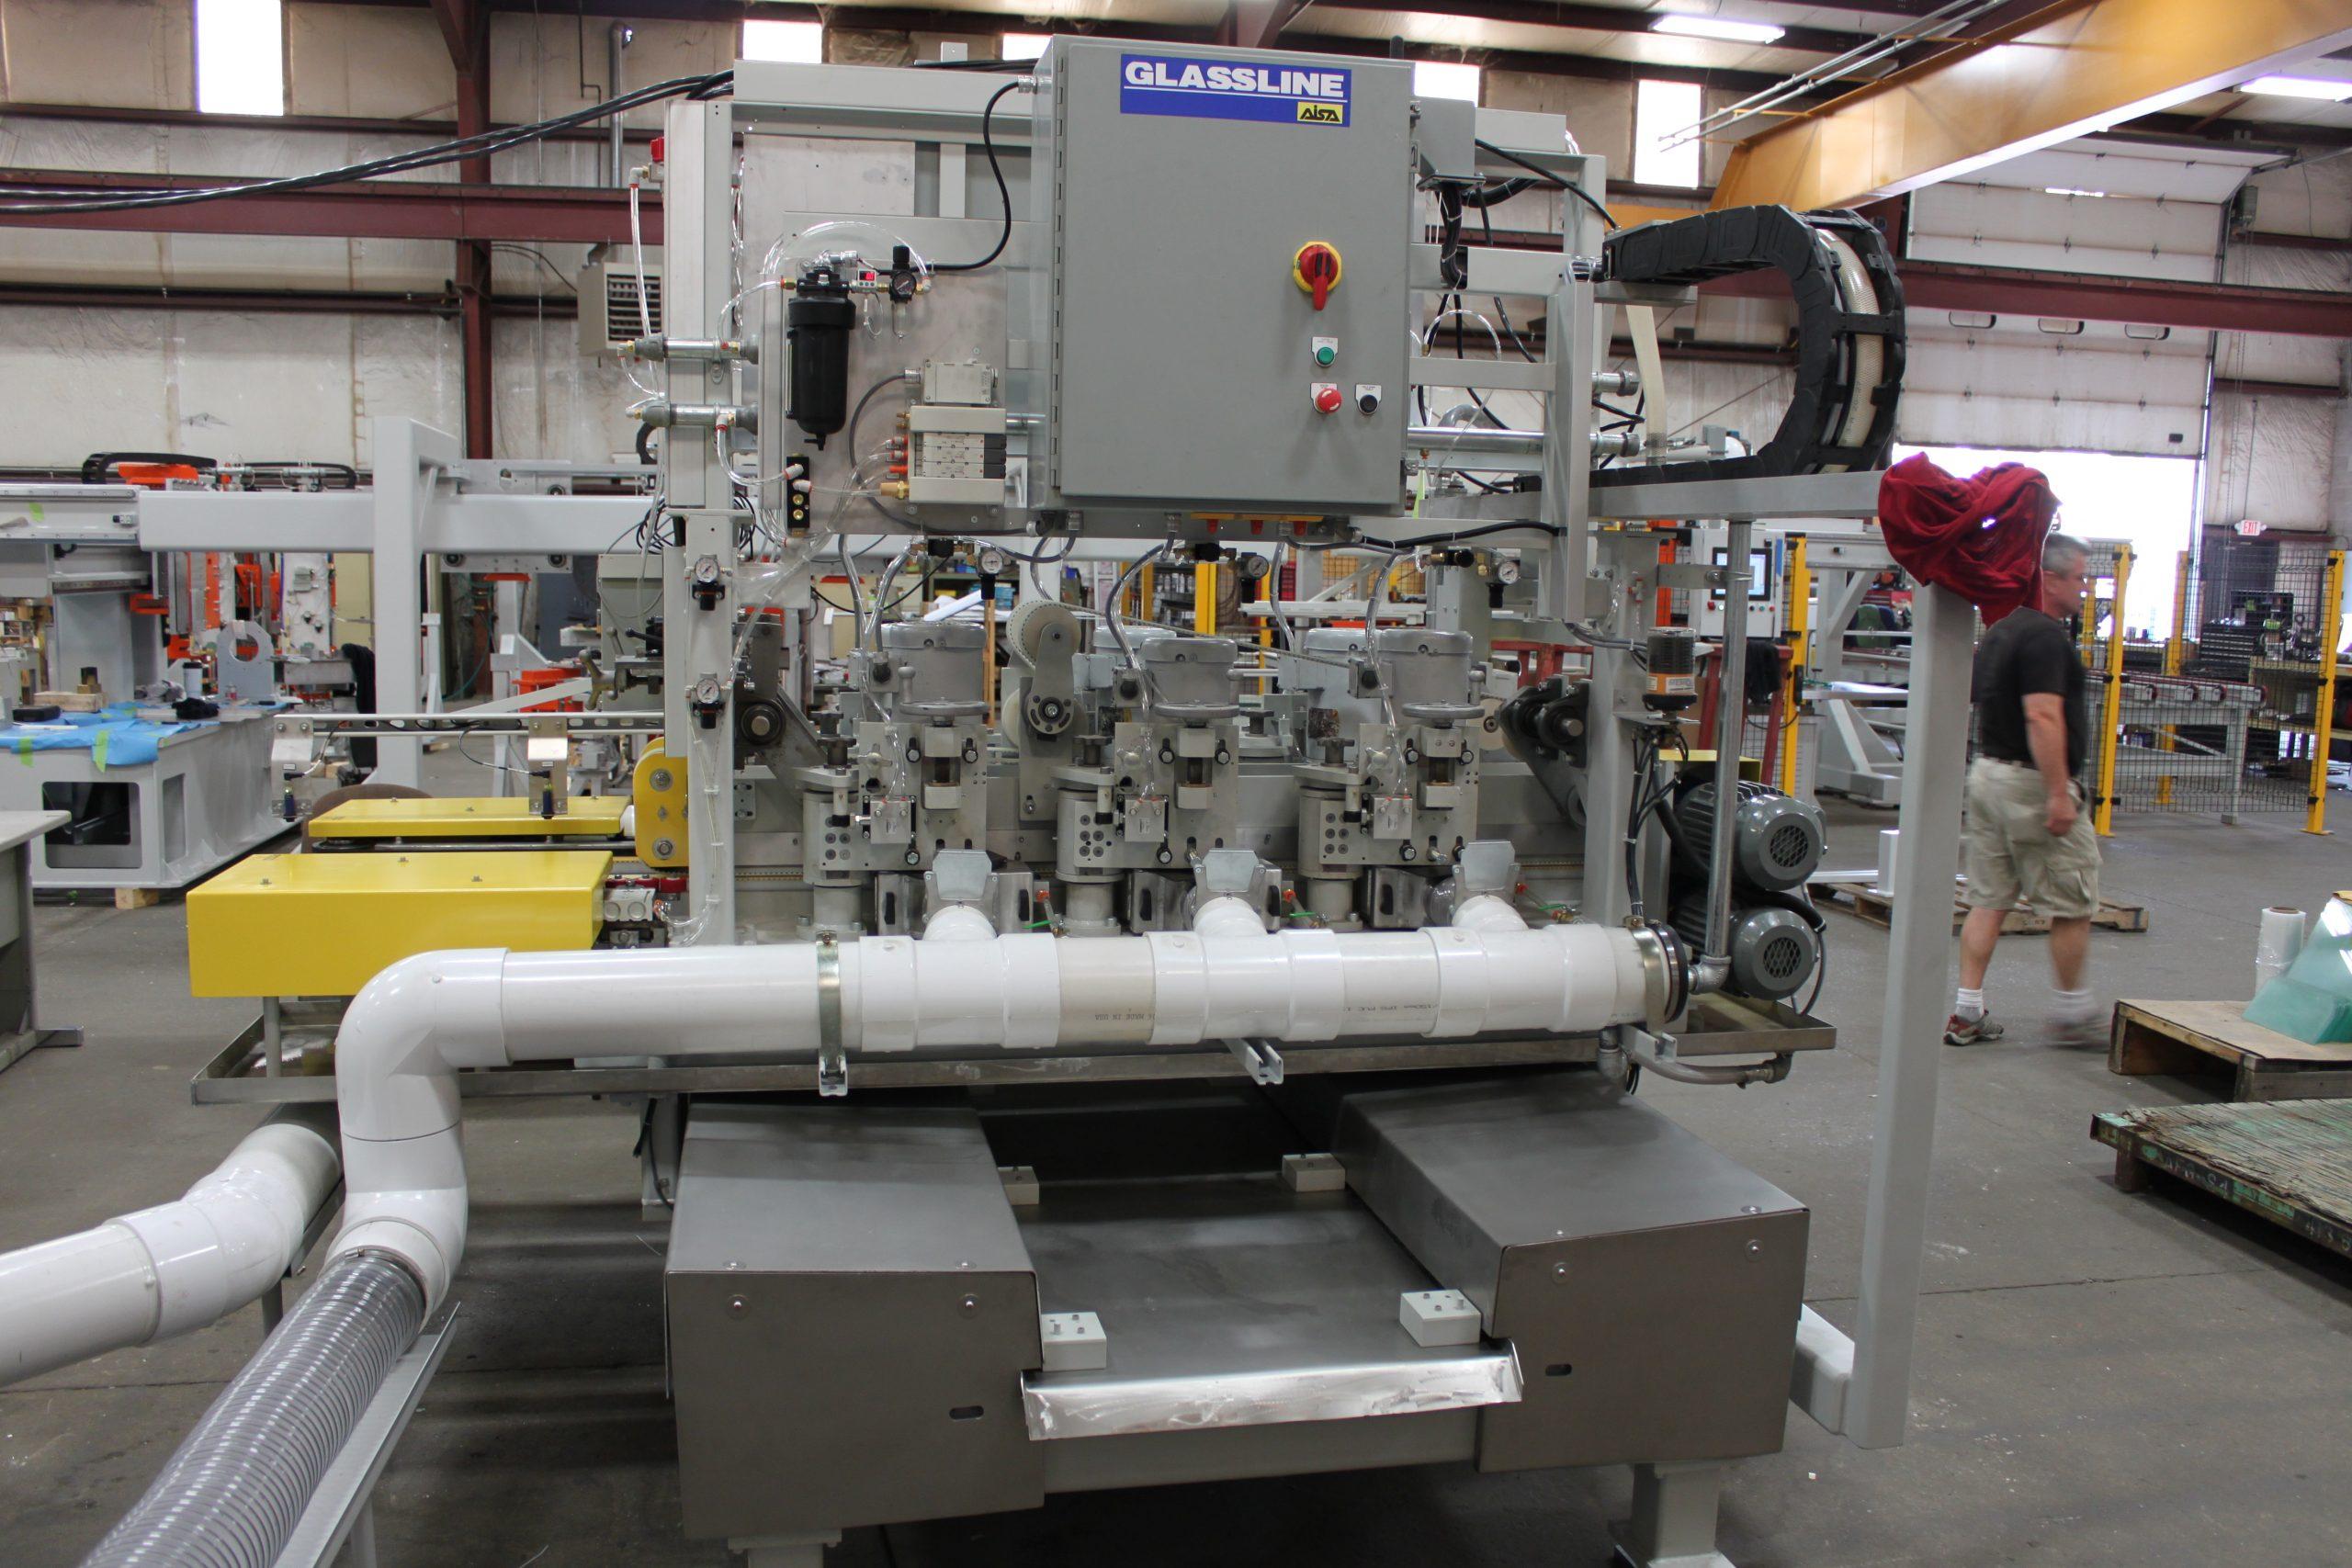 Double Edge Grinding Systems - Rebuilt machine - Glassline